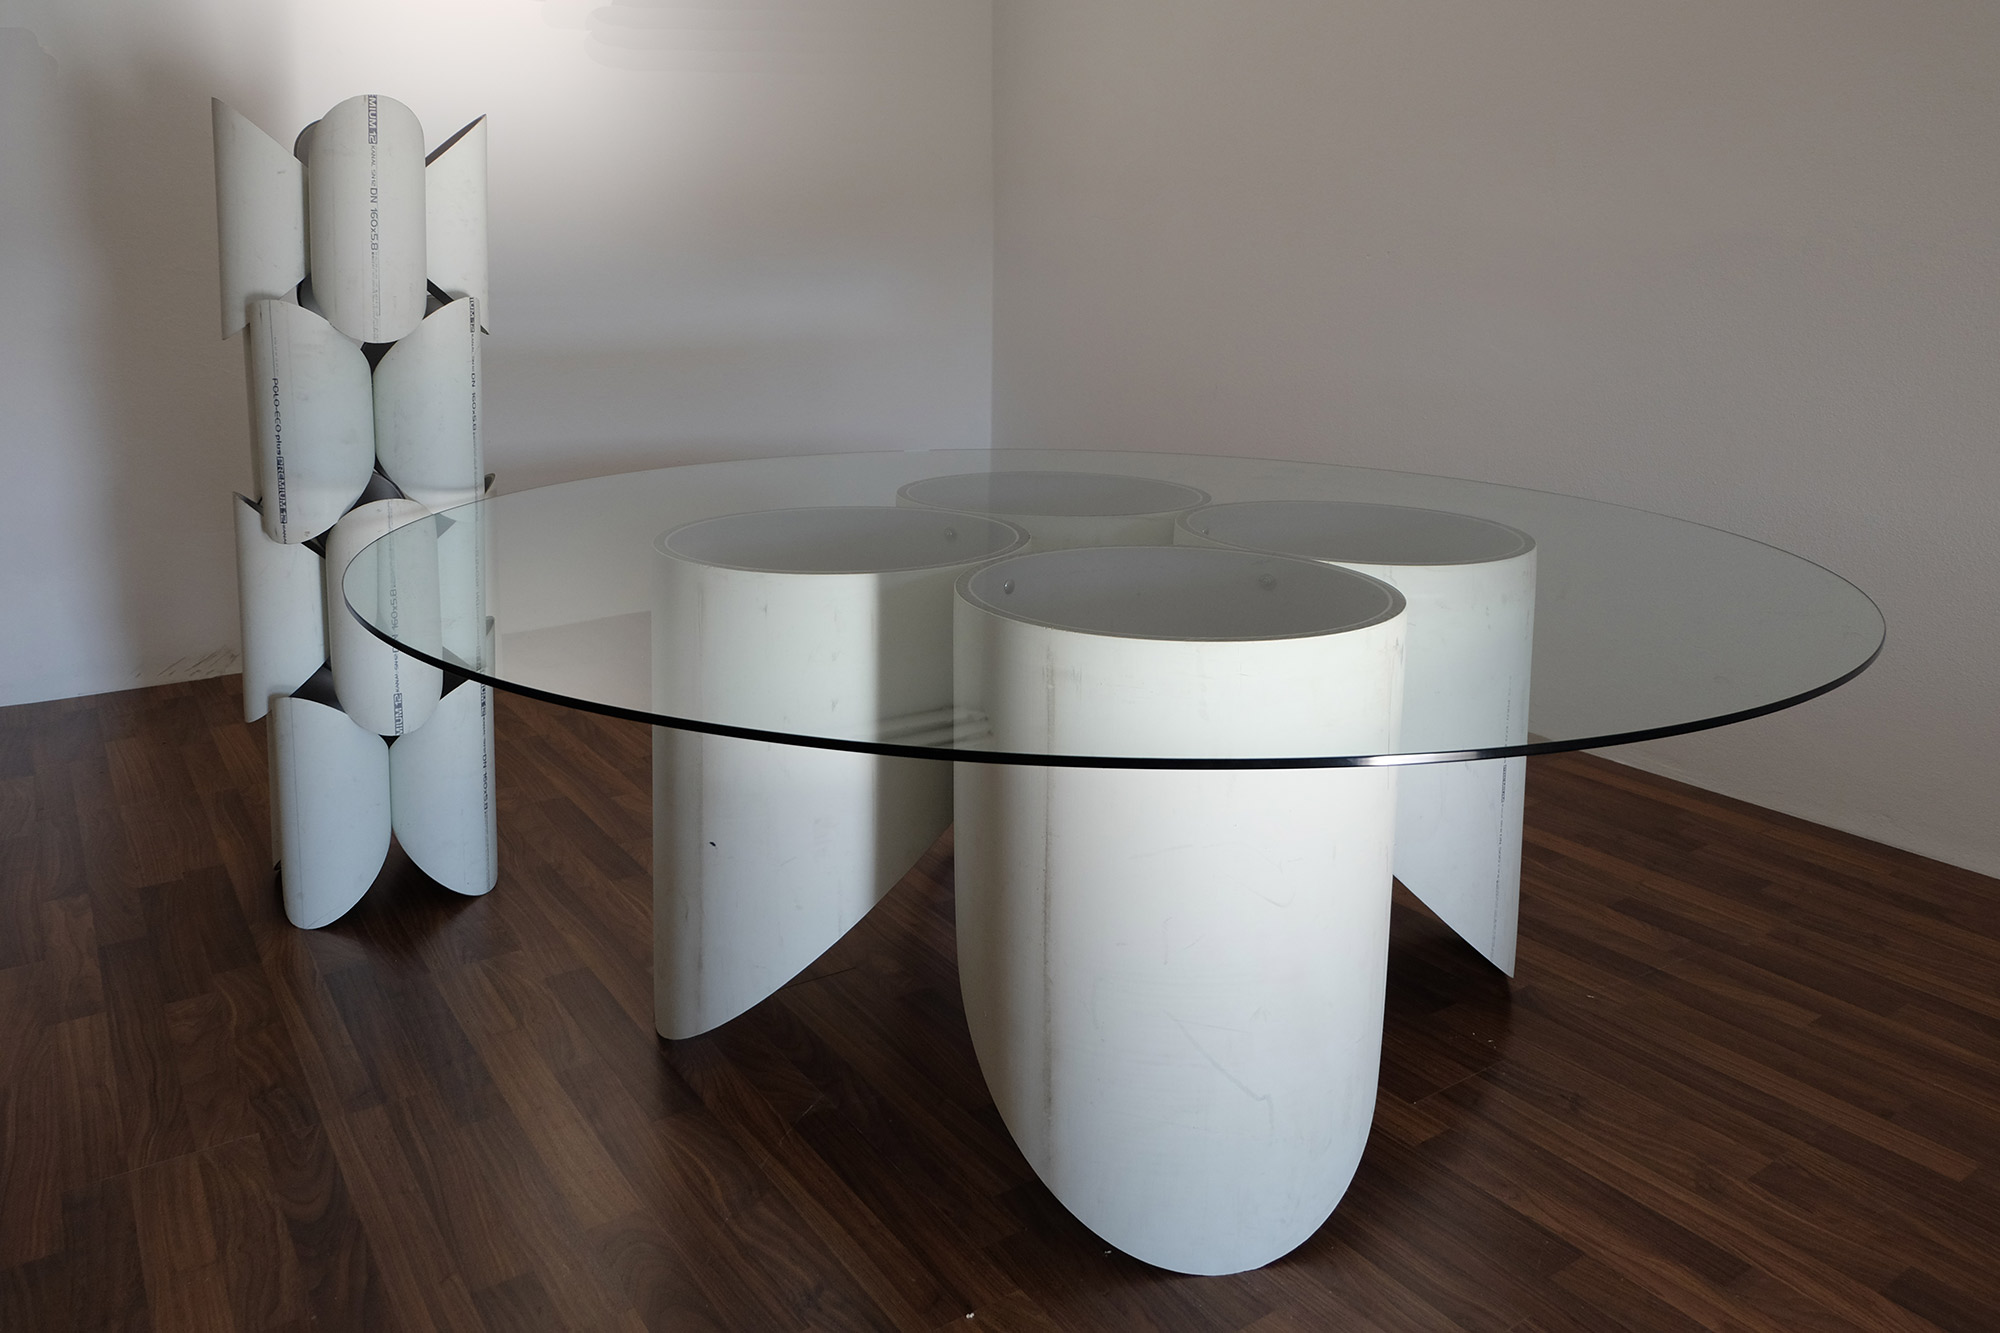 exclusive-furniture-guardian-table-glass-sculpture-statue-contemporary-light-art-design-antique-fine-art-manfred-kili-kielnhofer-7721